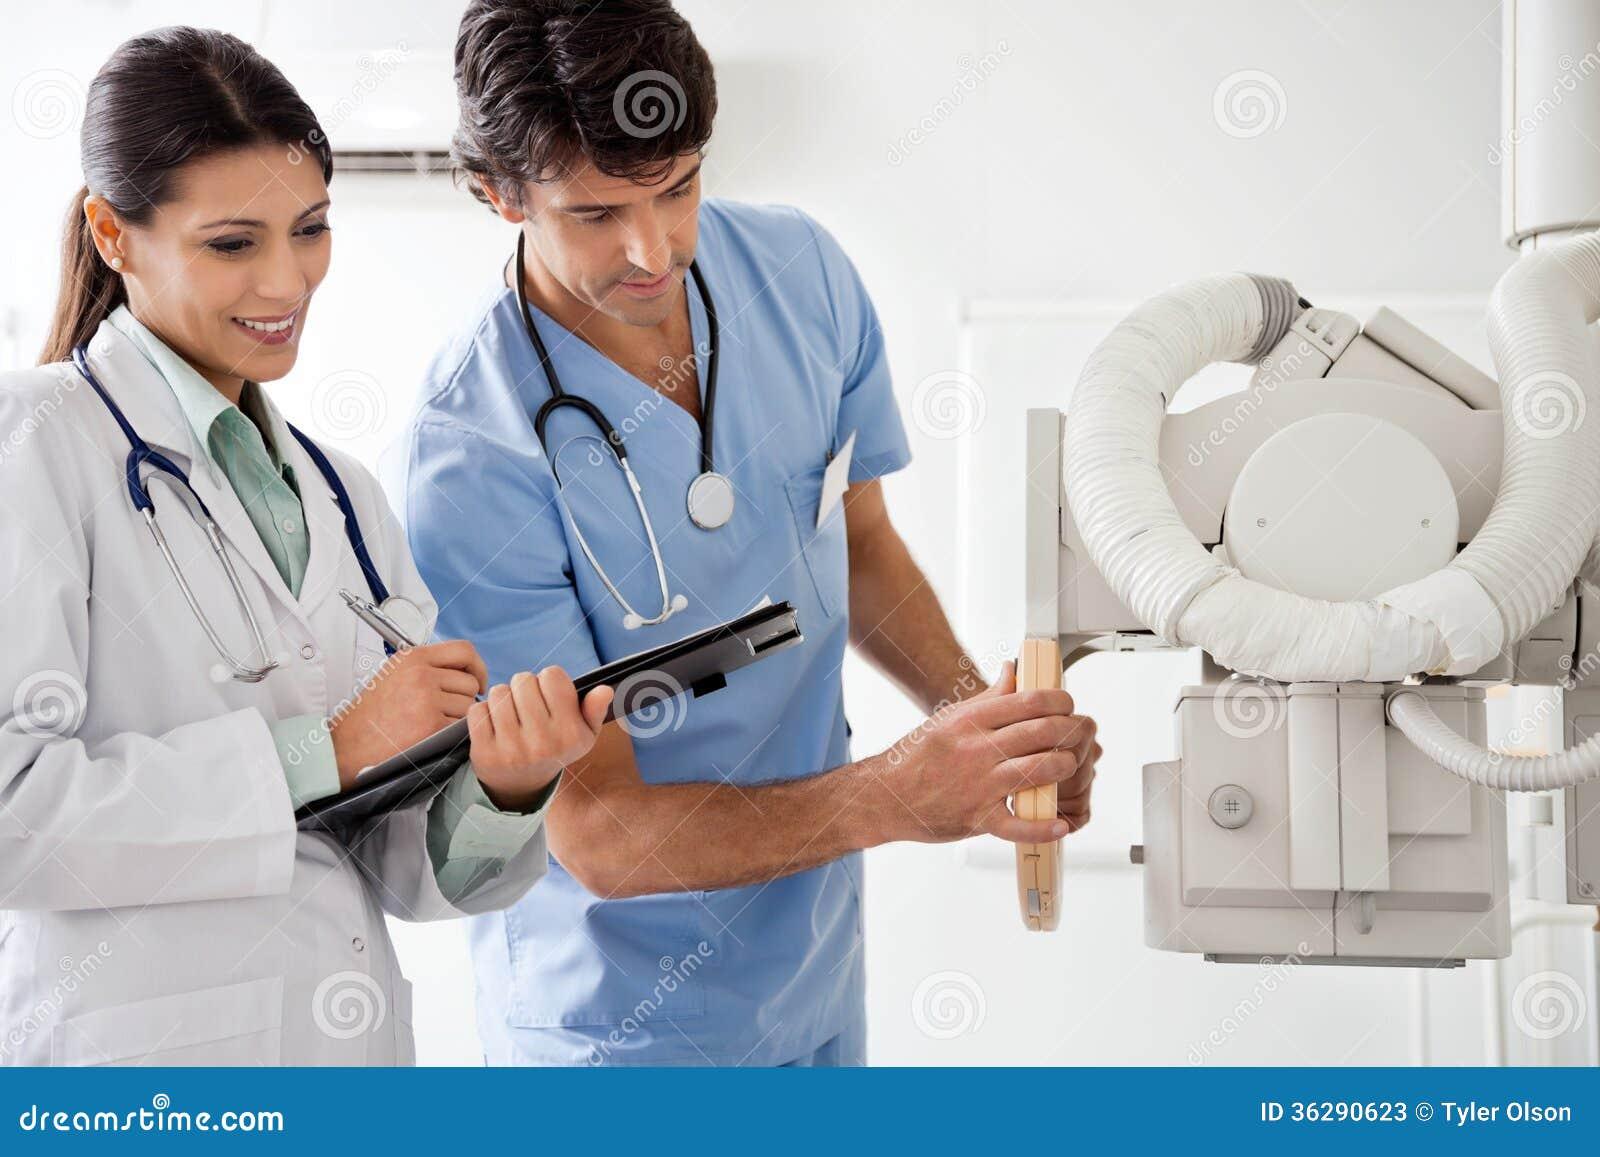 Radiology Technician Degrees